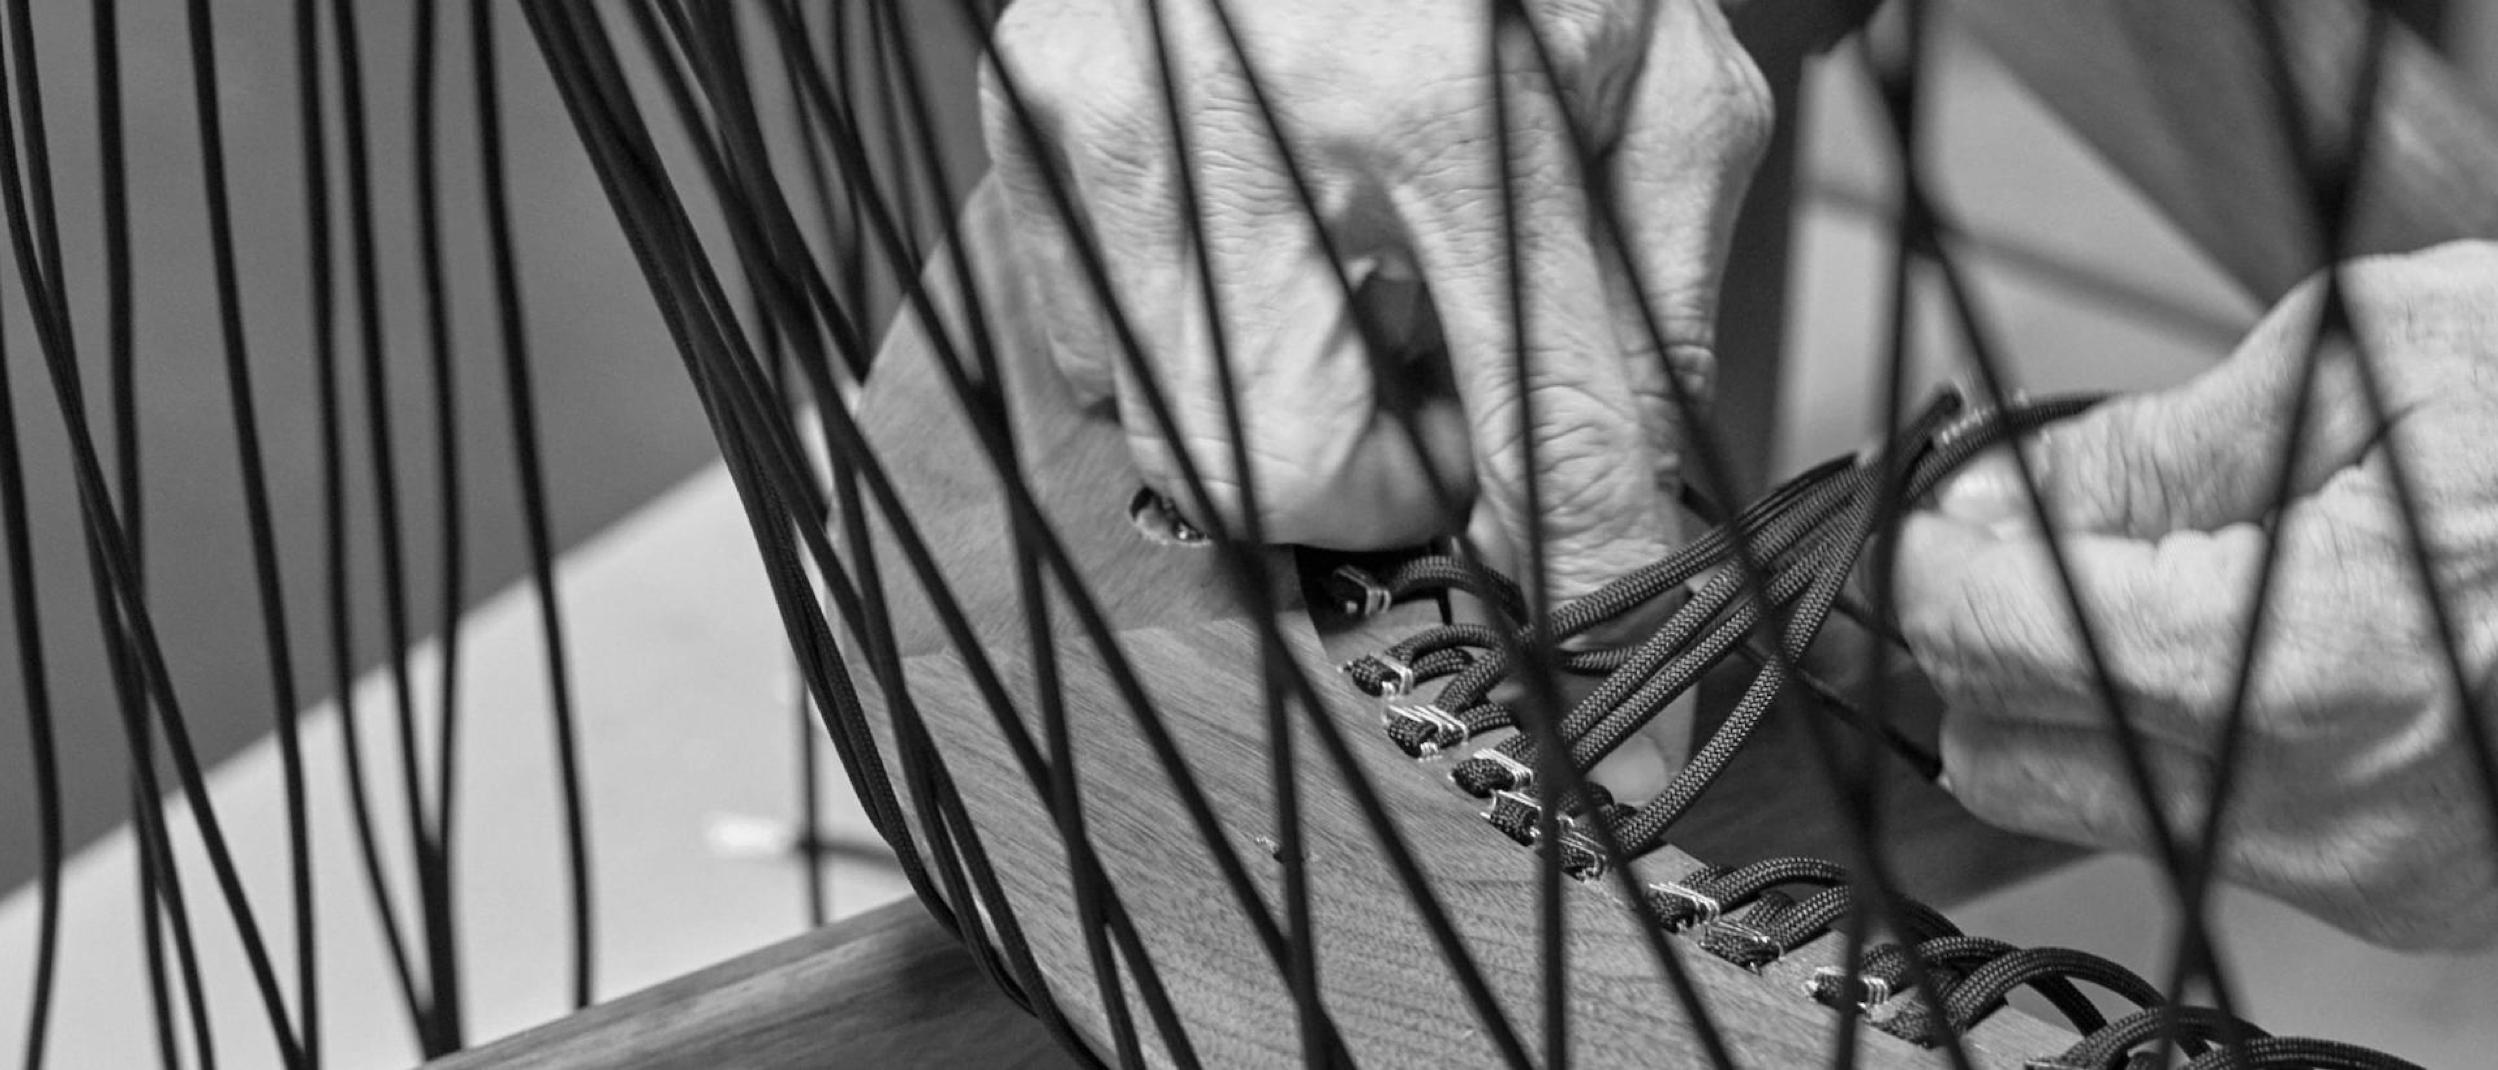 Hands assembling the Crosshatch back.